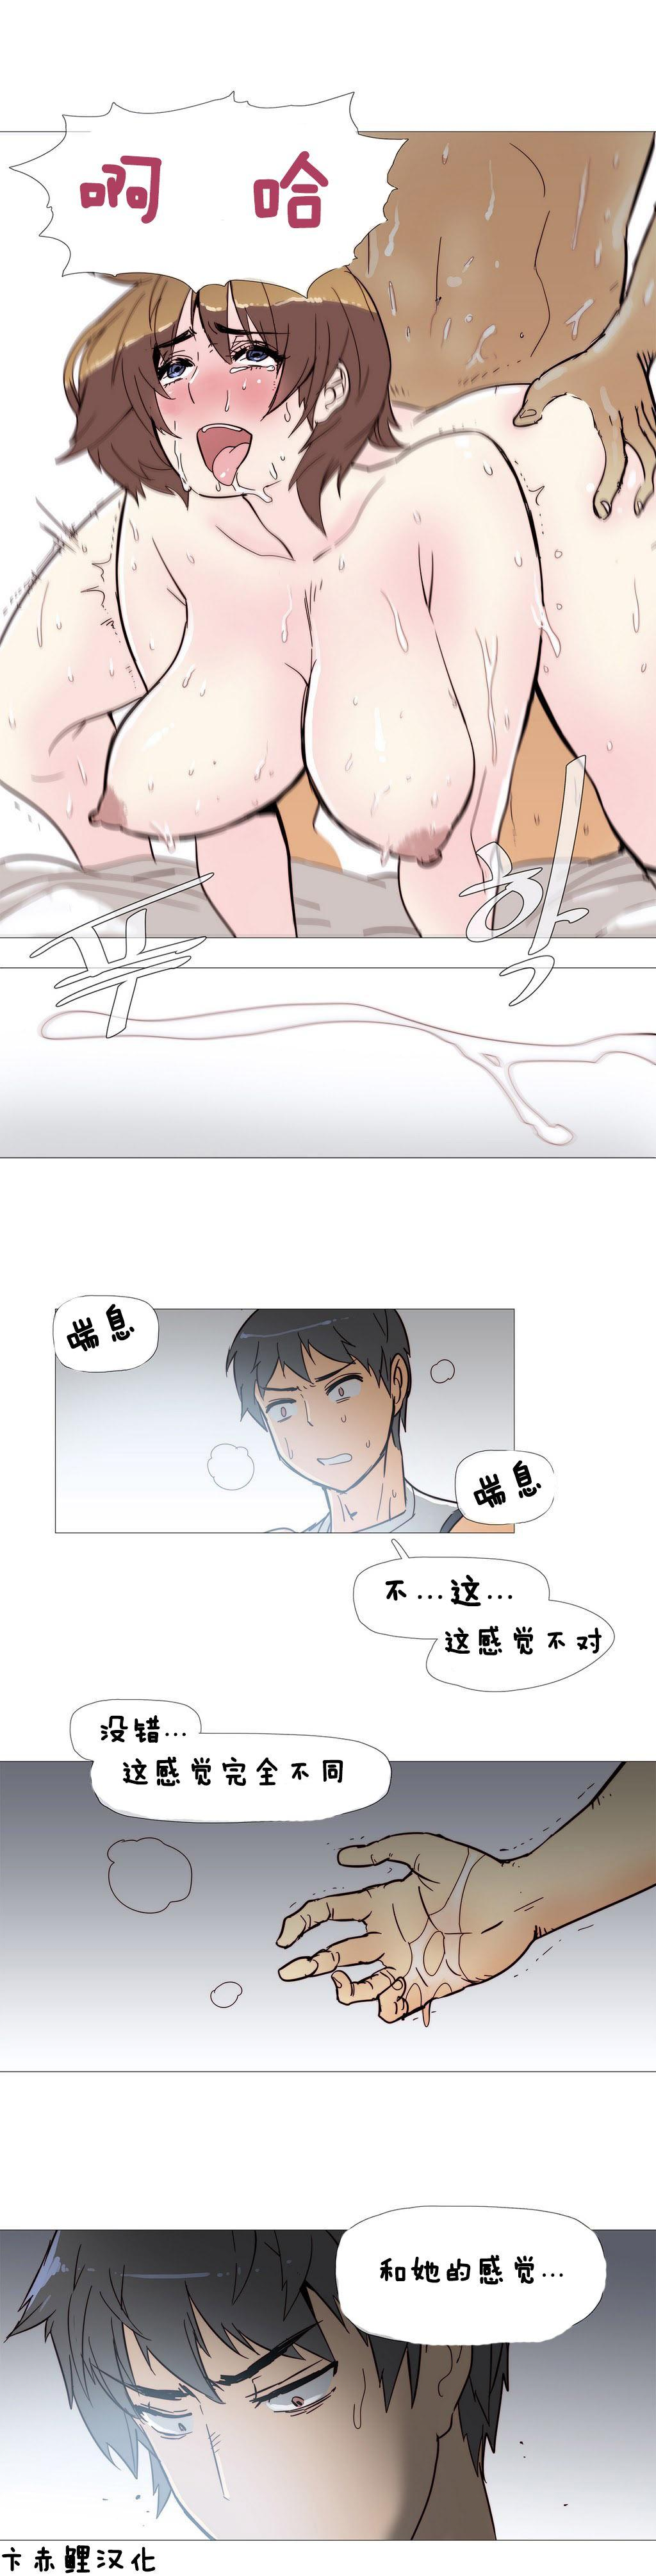 HouseHold Affairs 【卞赤鲤汉化】1~15话 56